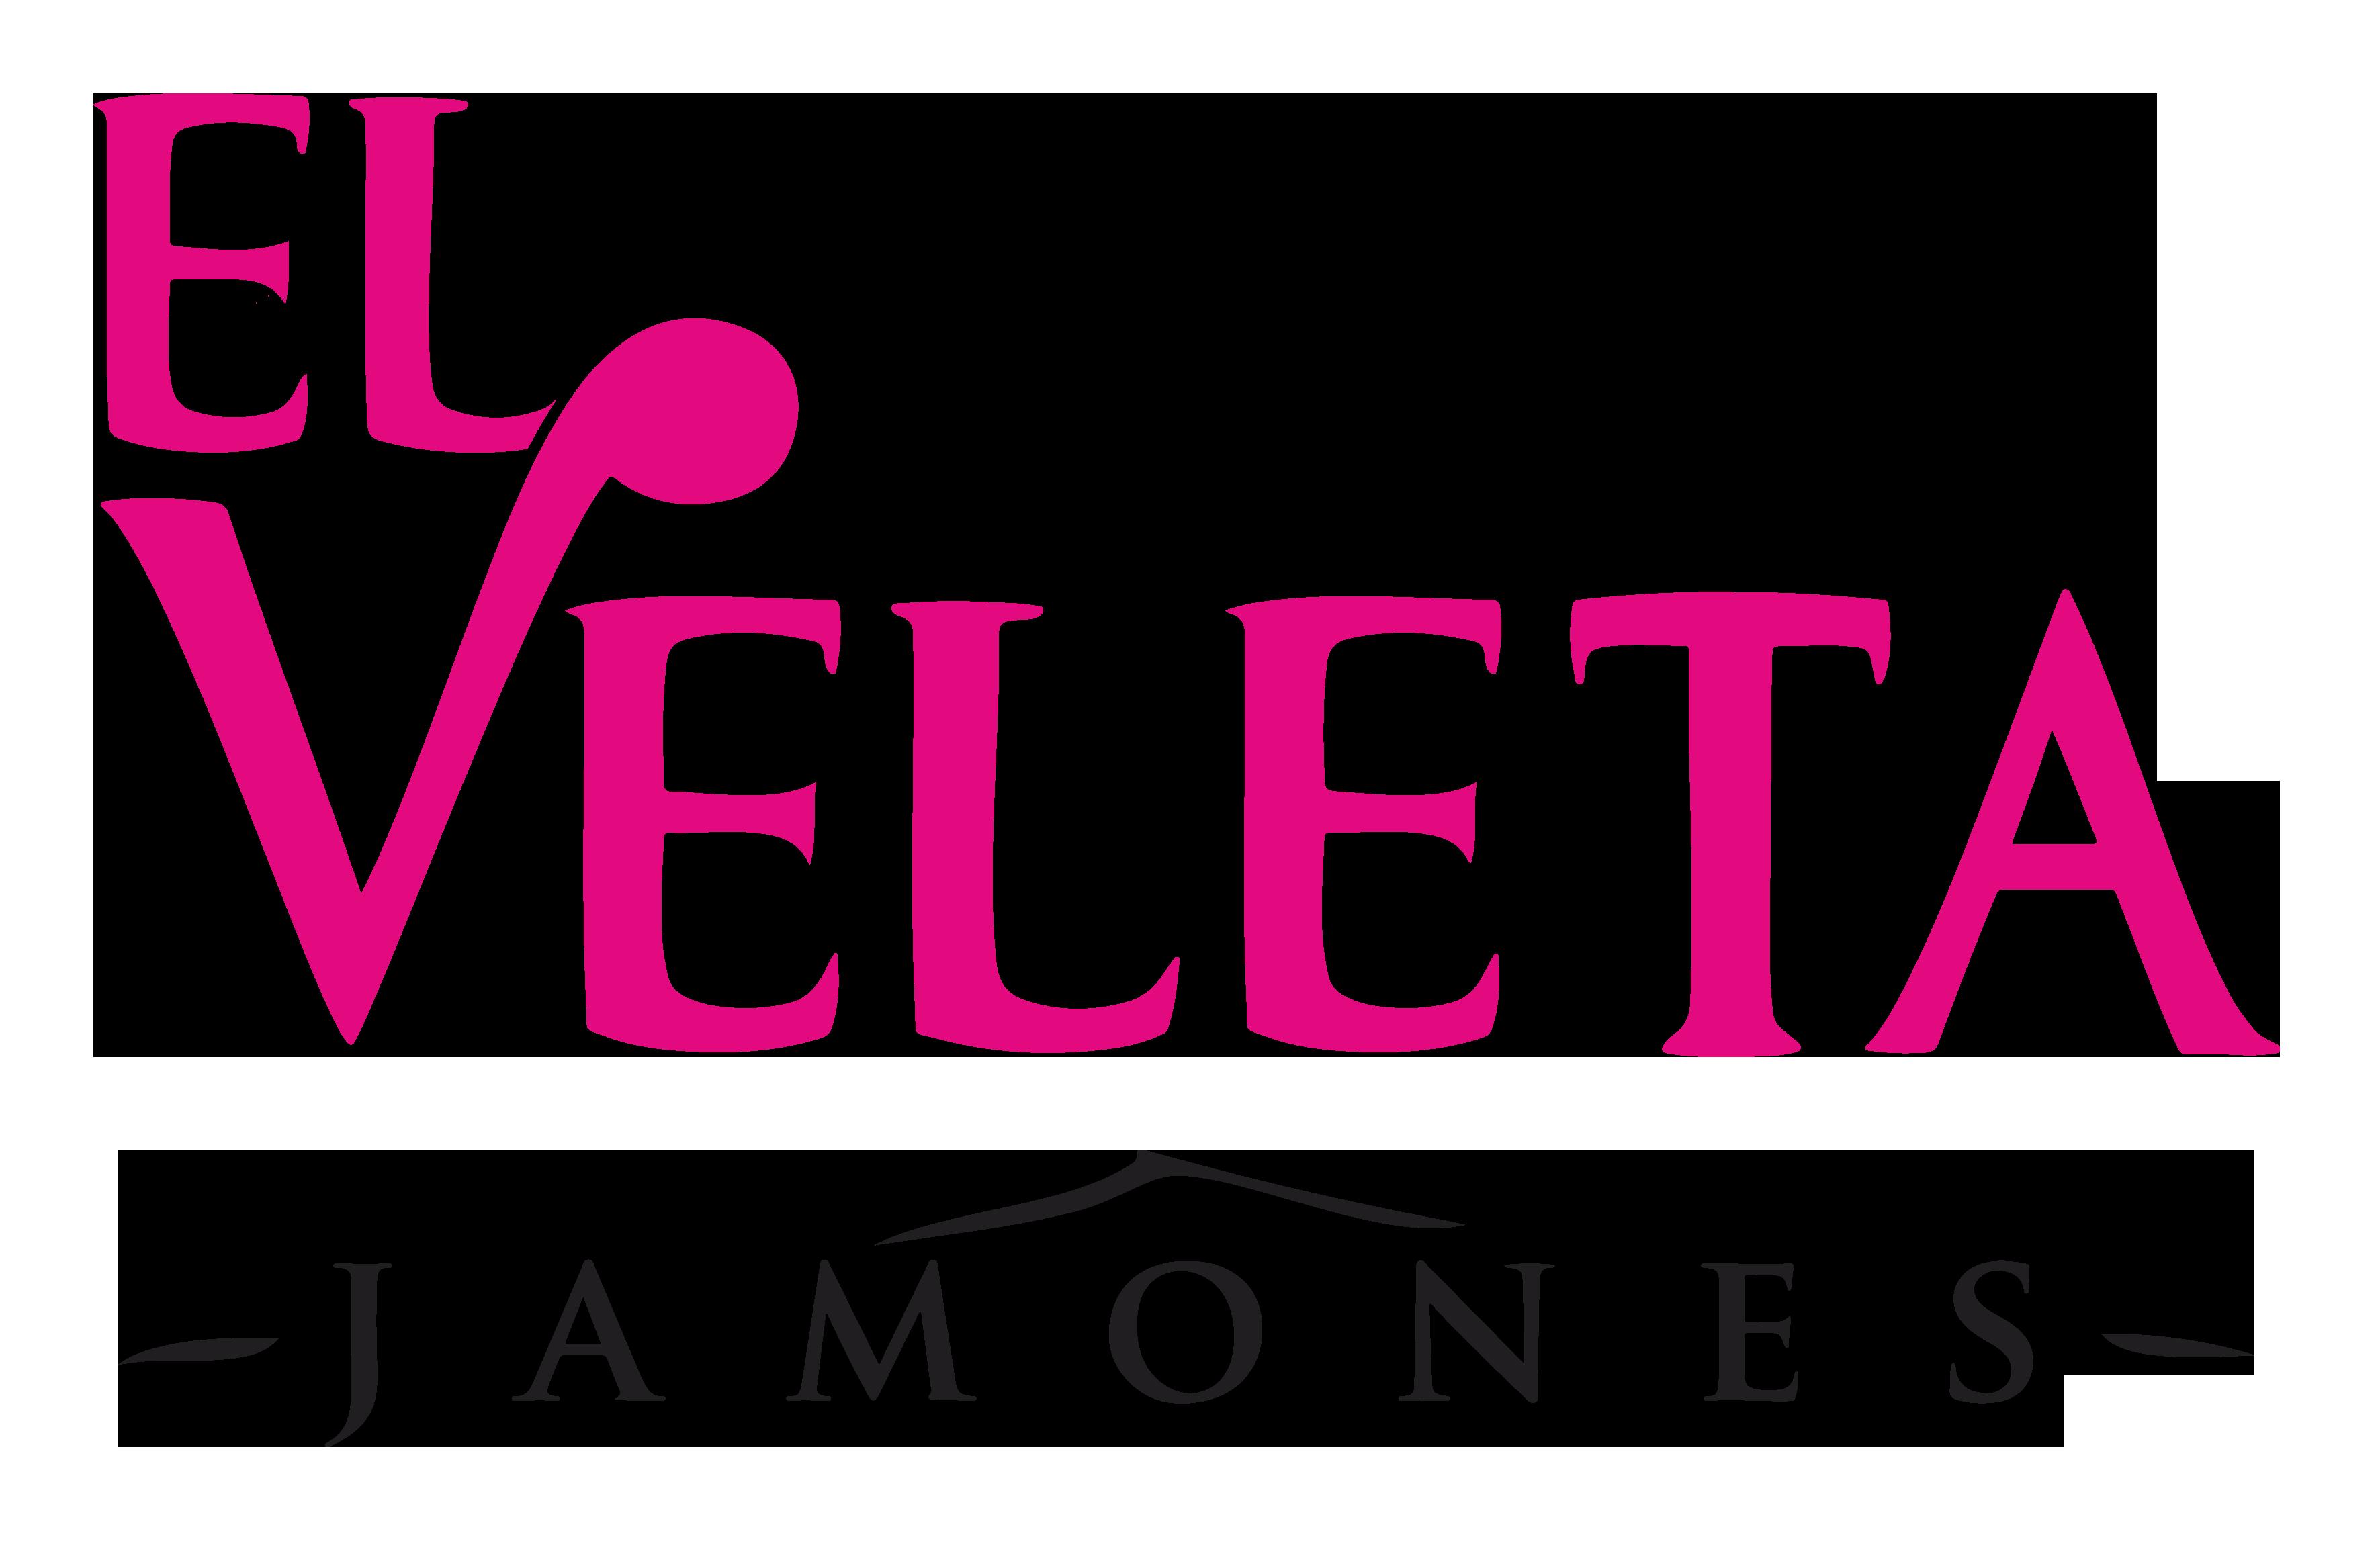 Jamones El Veleta